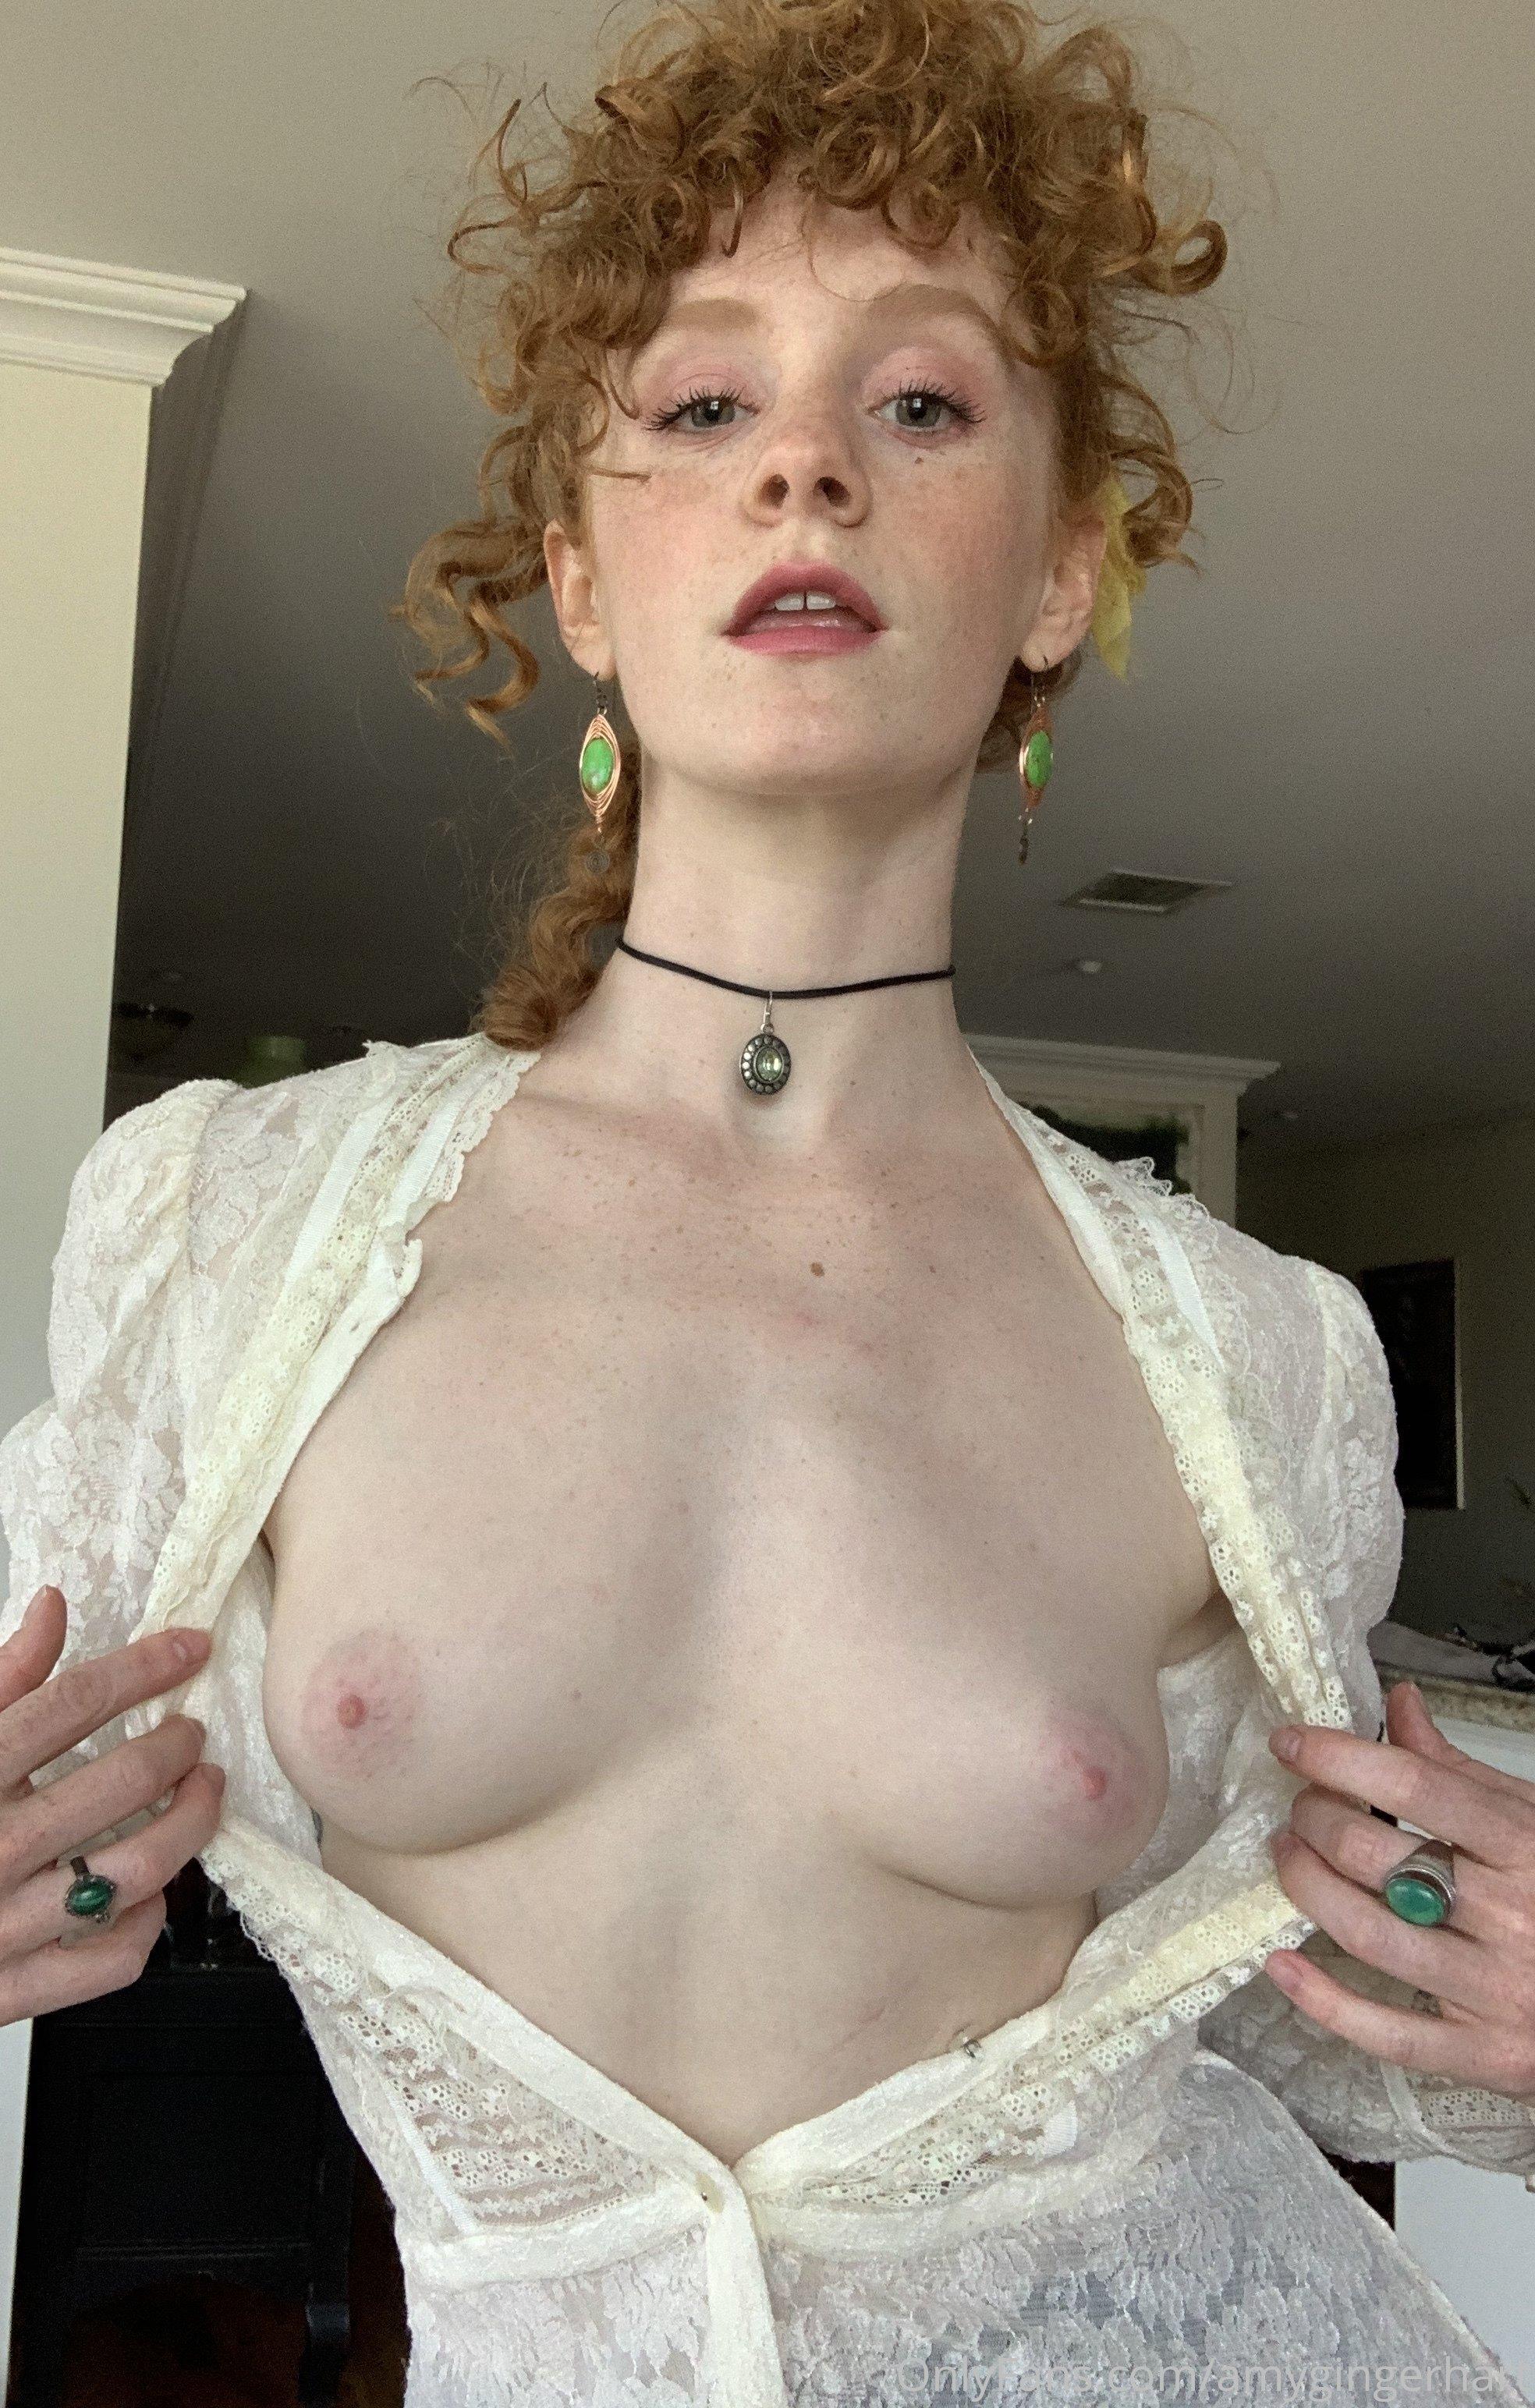 Amy Hart, Amygingerhart, Onlyfans 0257